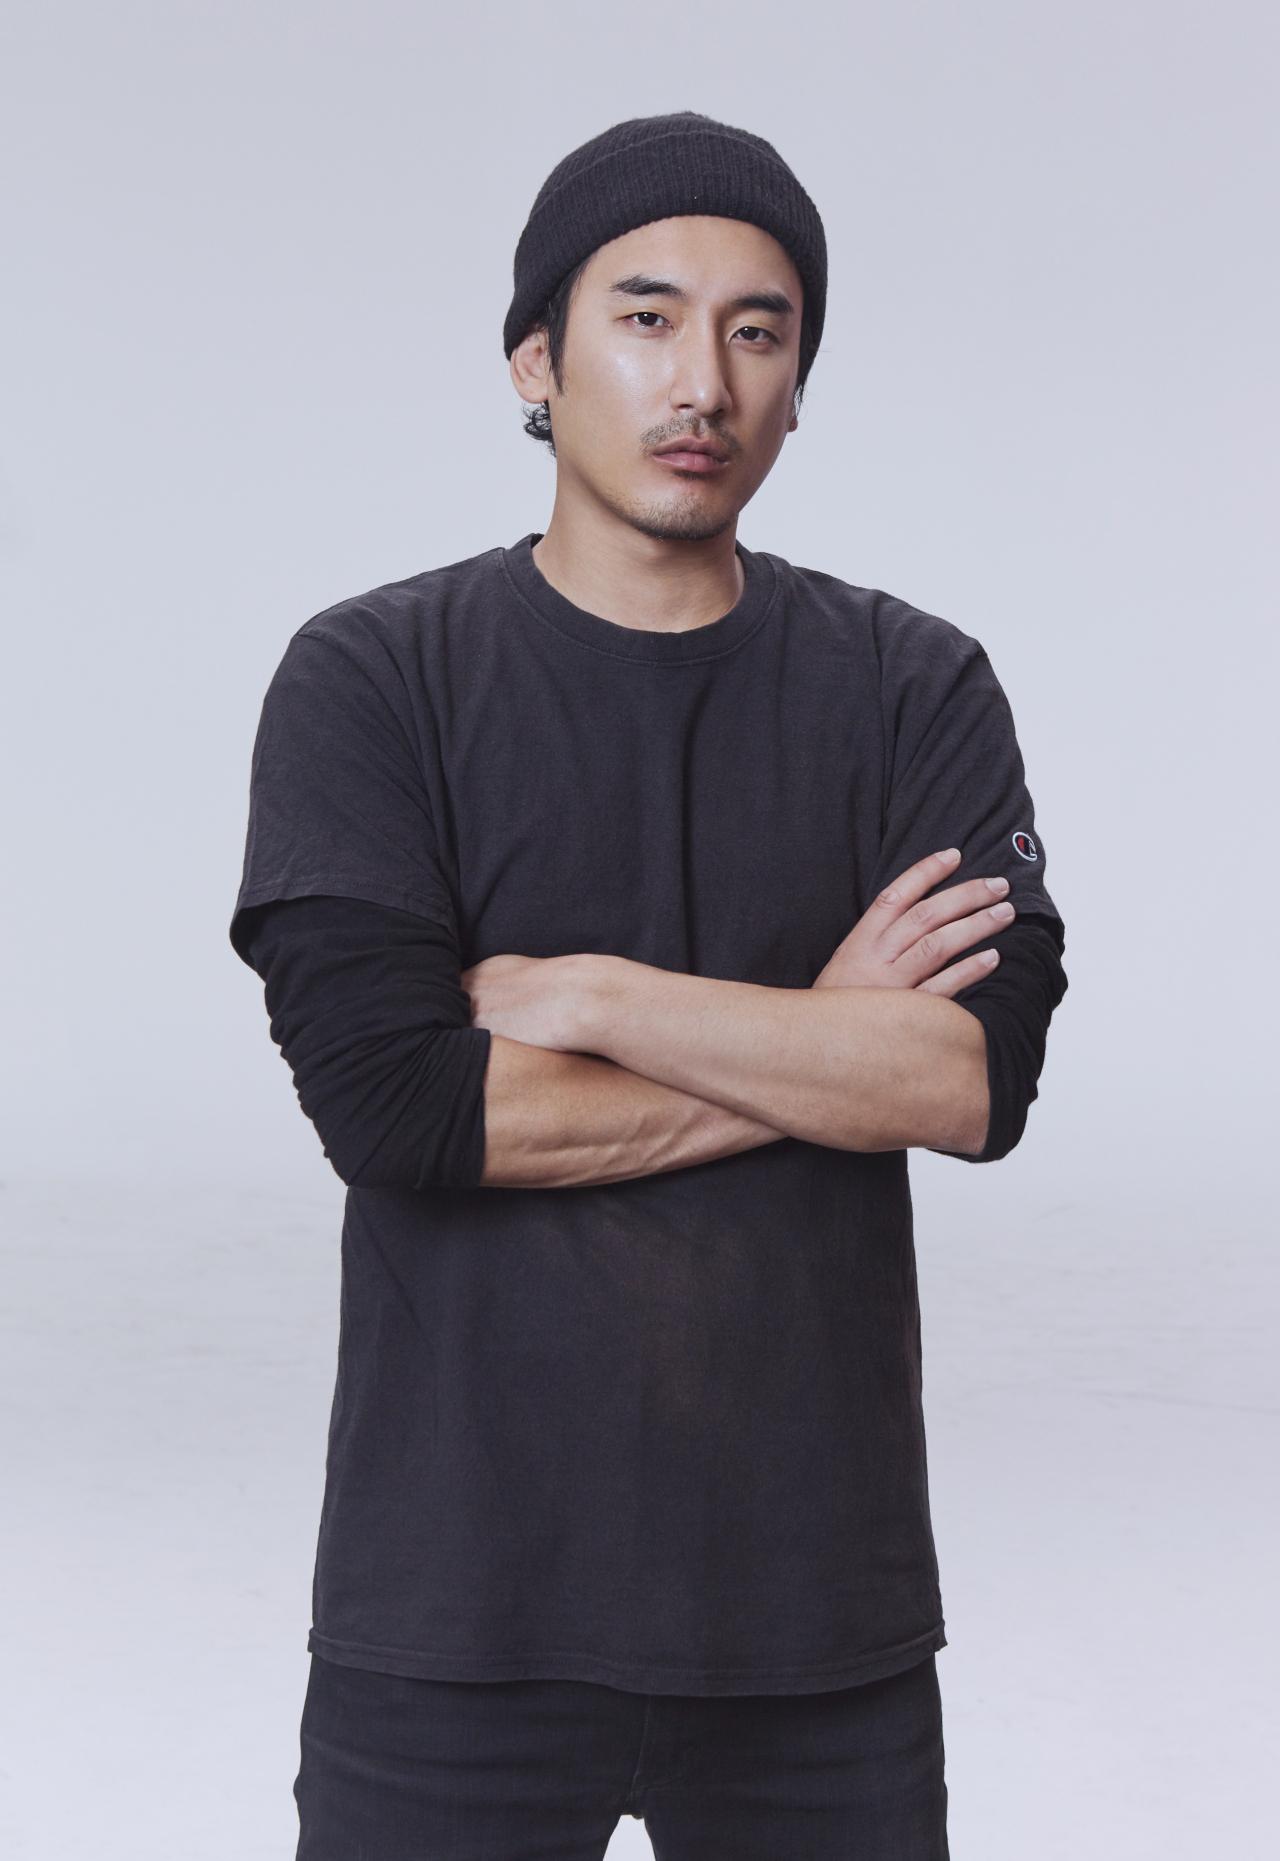 Shin Woo-seok